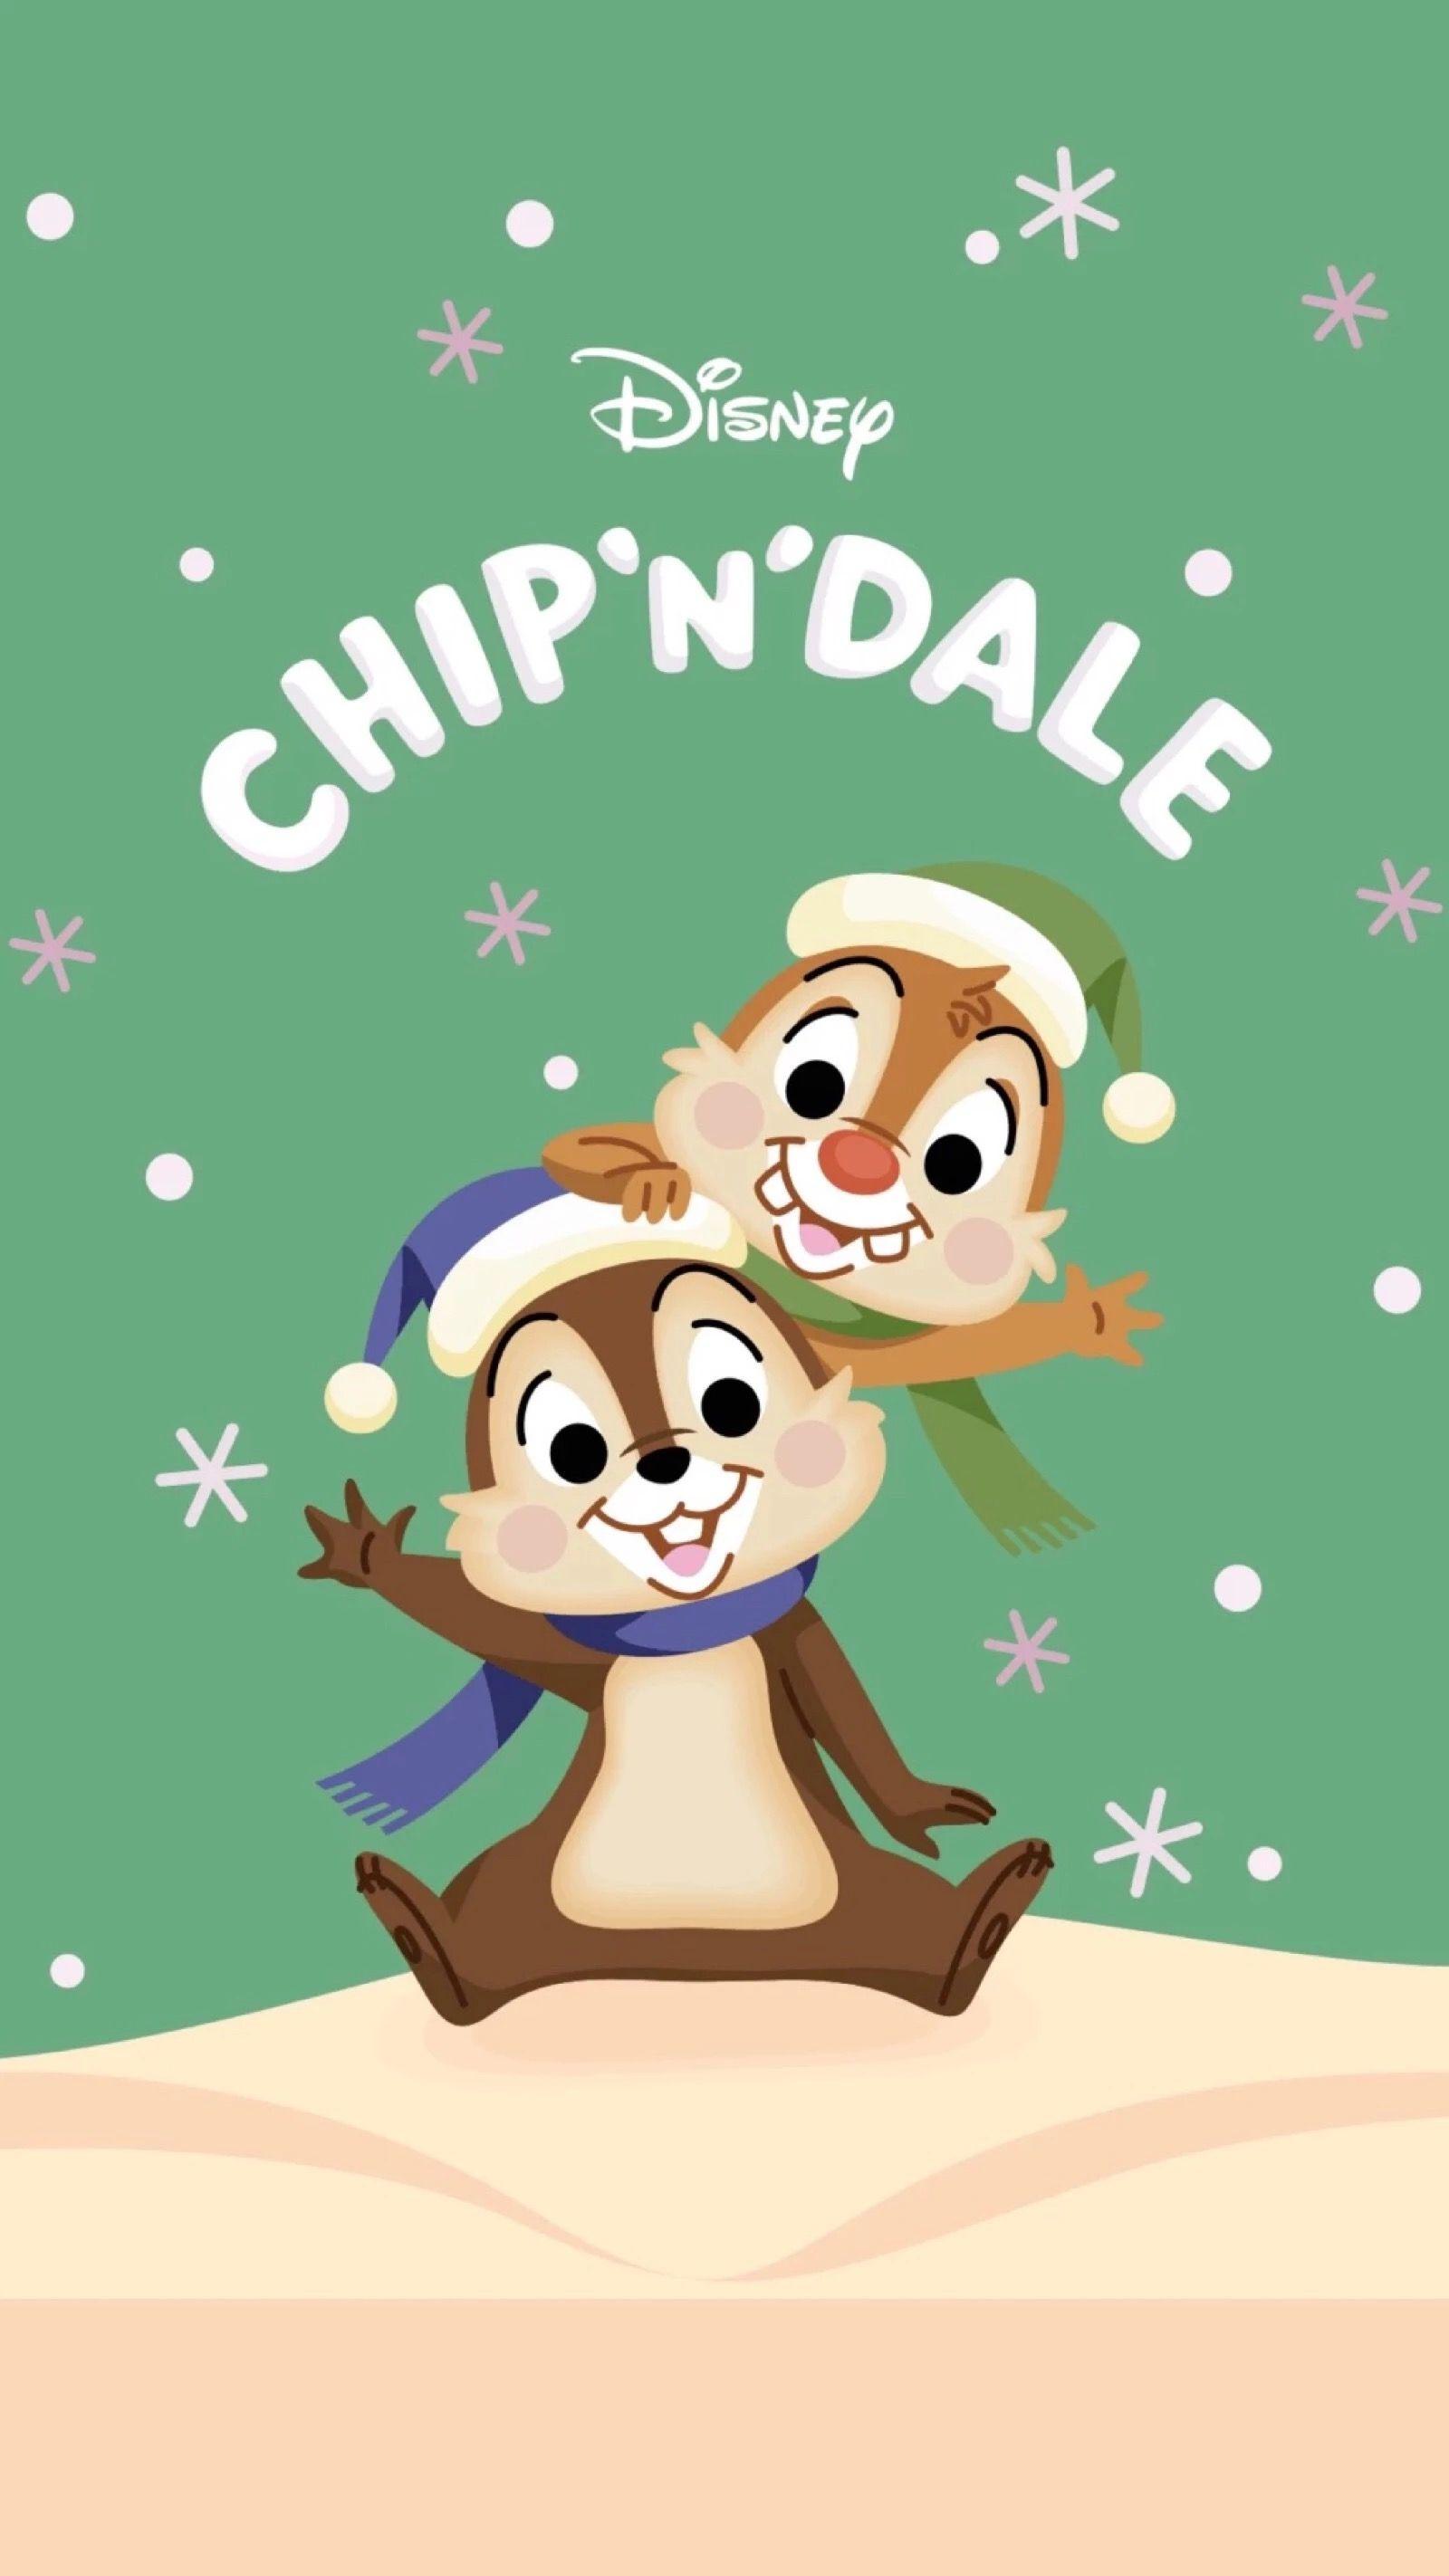 Chip N Dale Wallpaper Disney Background Disney Phone